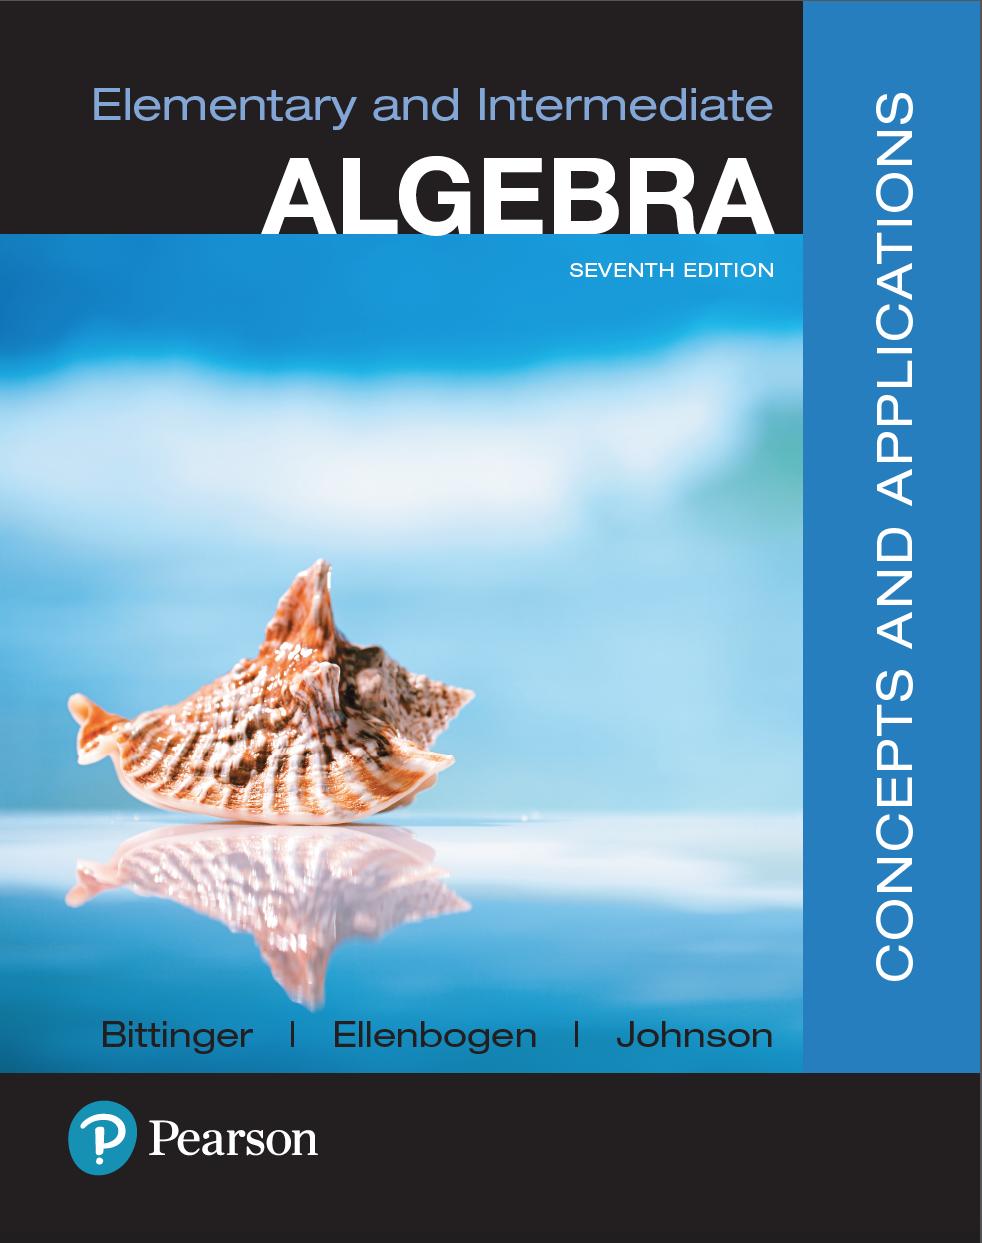 Elementary_Algebra.png